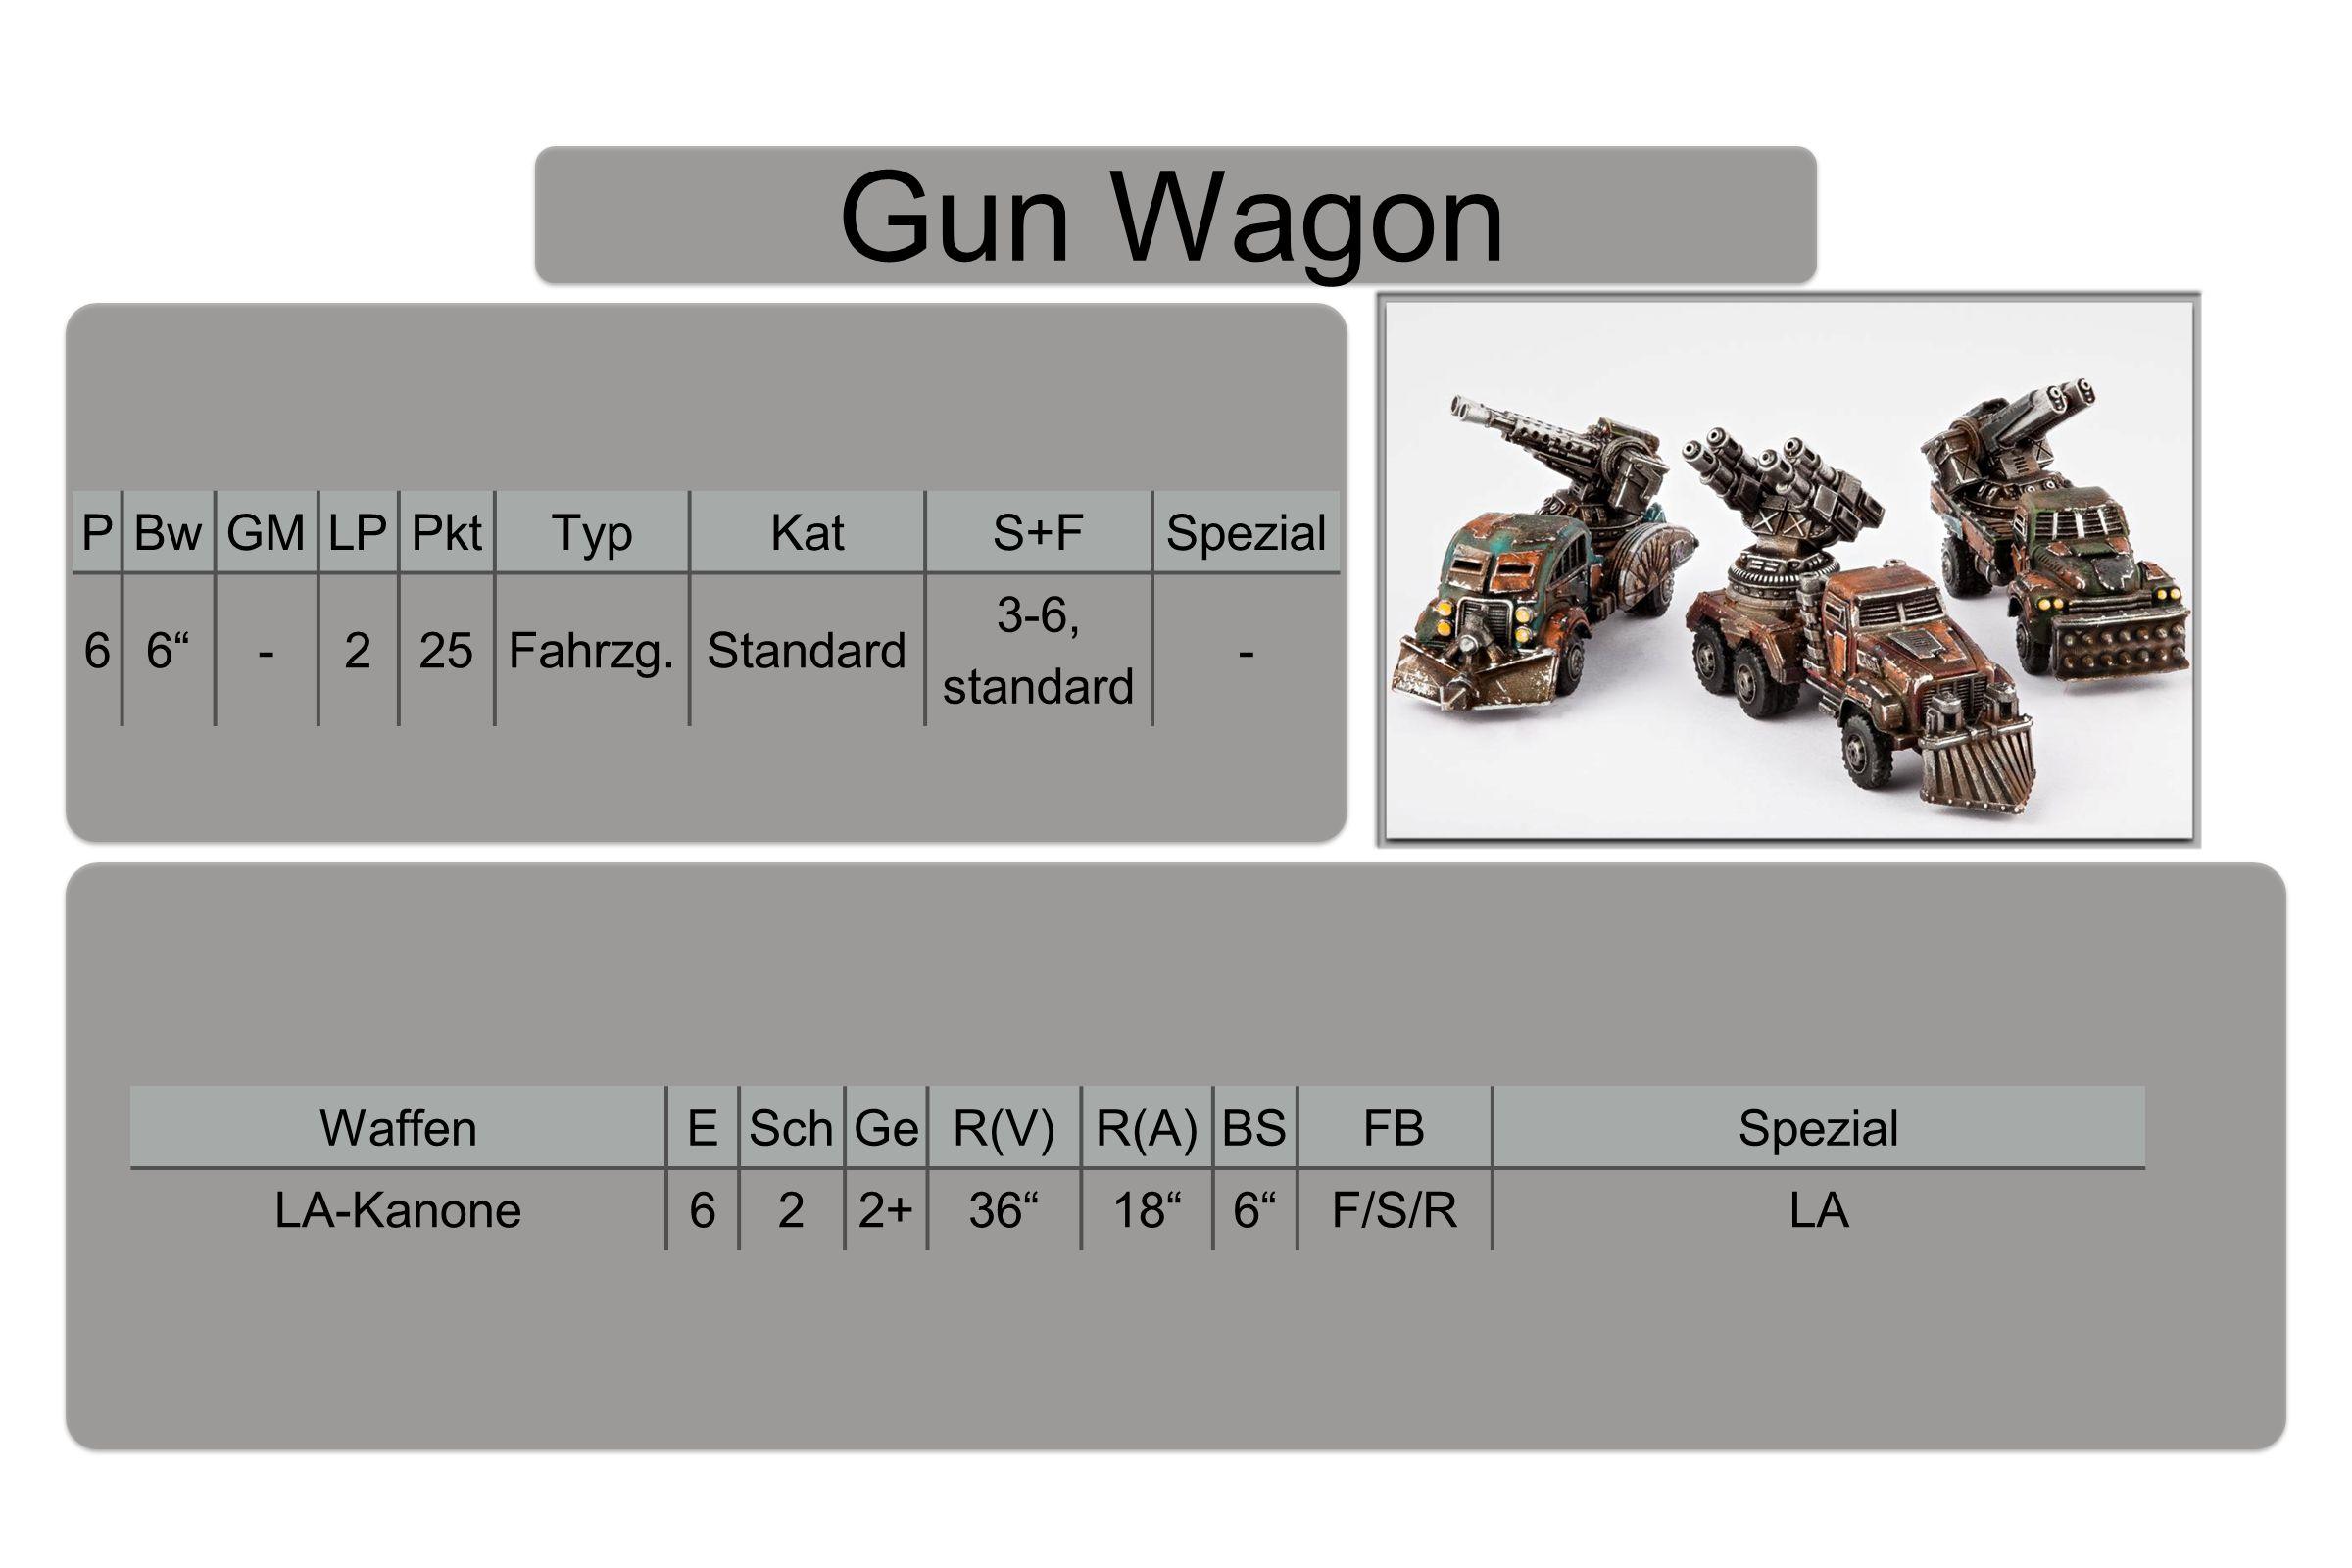 Gun Wagon PBwGMLPPktTypKatS+FSpezial 66 -225Fahrzg.Standard 3-6, standard - WaffenESchGeR(V)R(A)BSFBSpezial LA-Kanone622+36 18 6 F/S/RLA